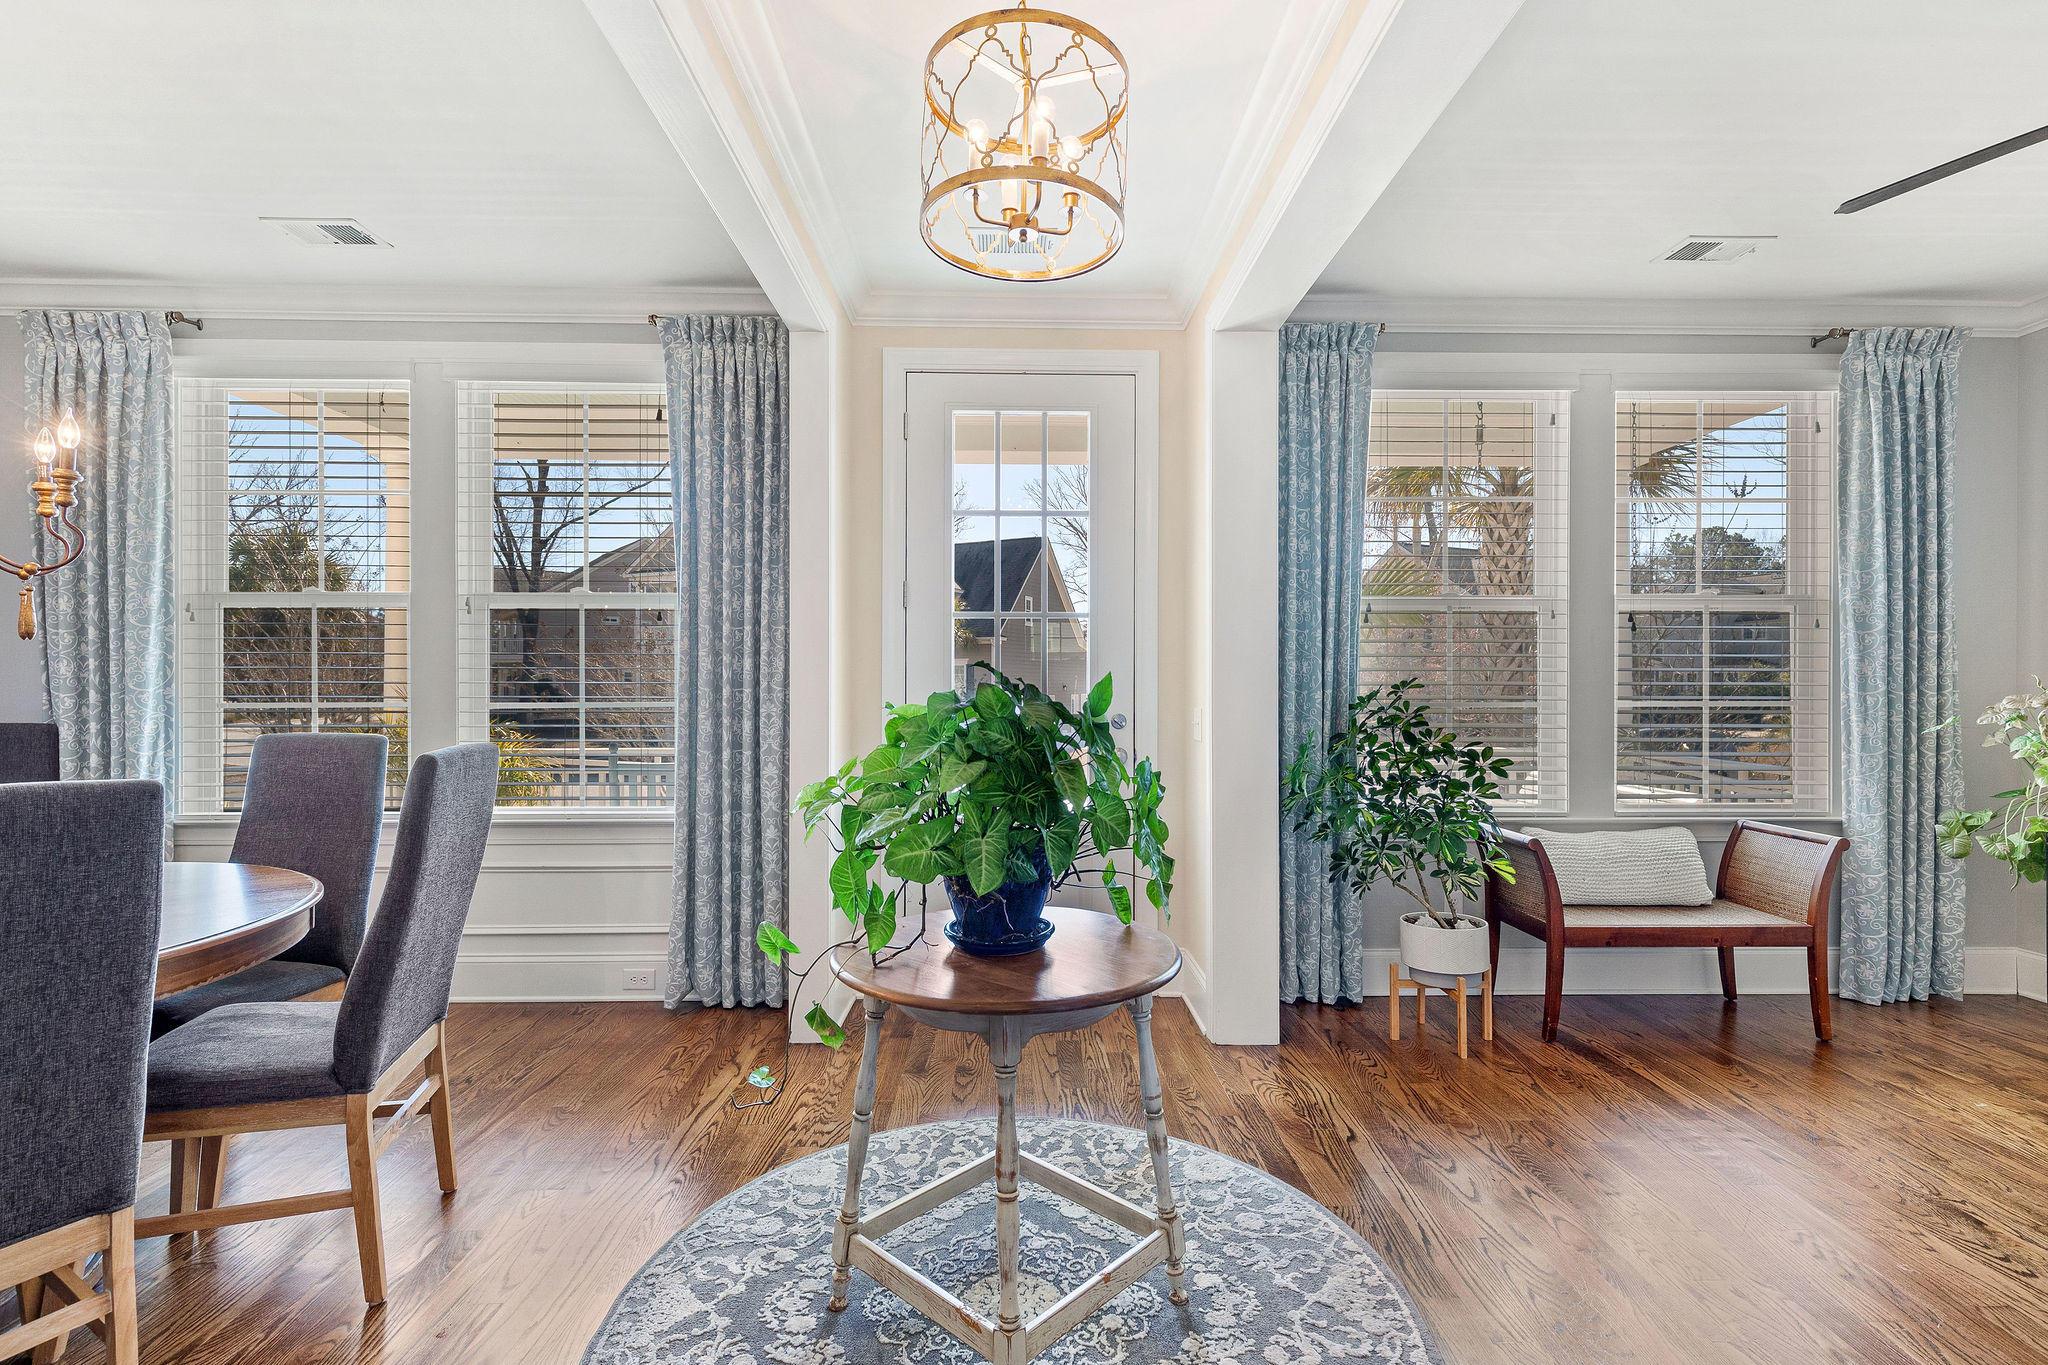 Dunes West Homes For Sale - 3212 Hatchway, Mount Pleasant, SC - 33